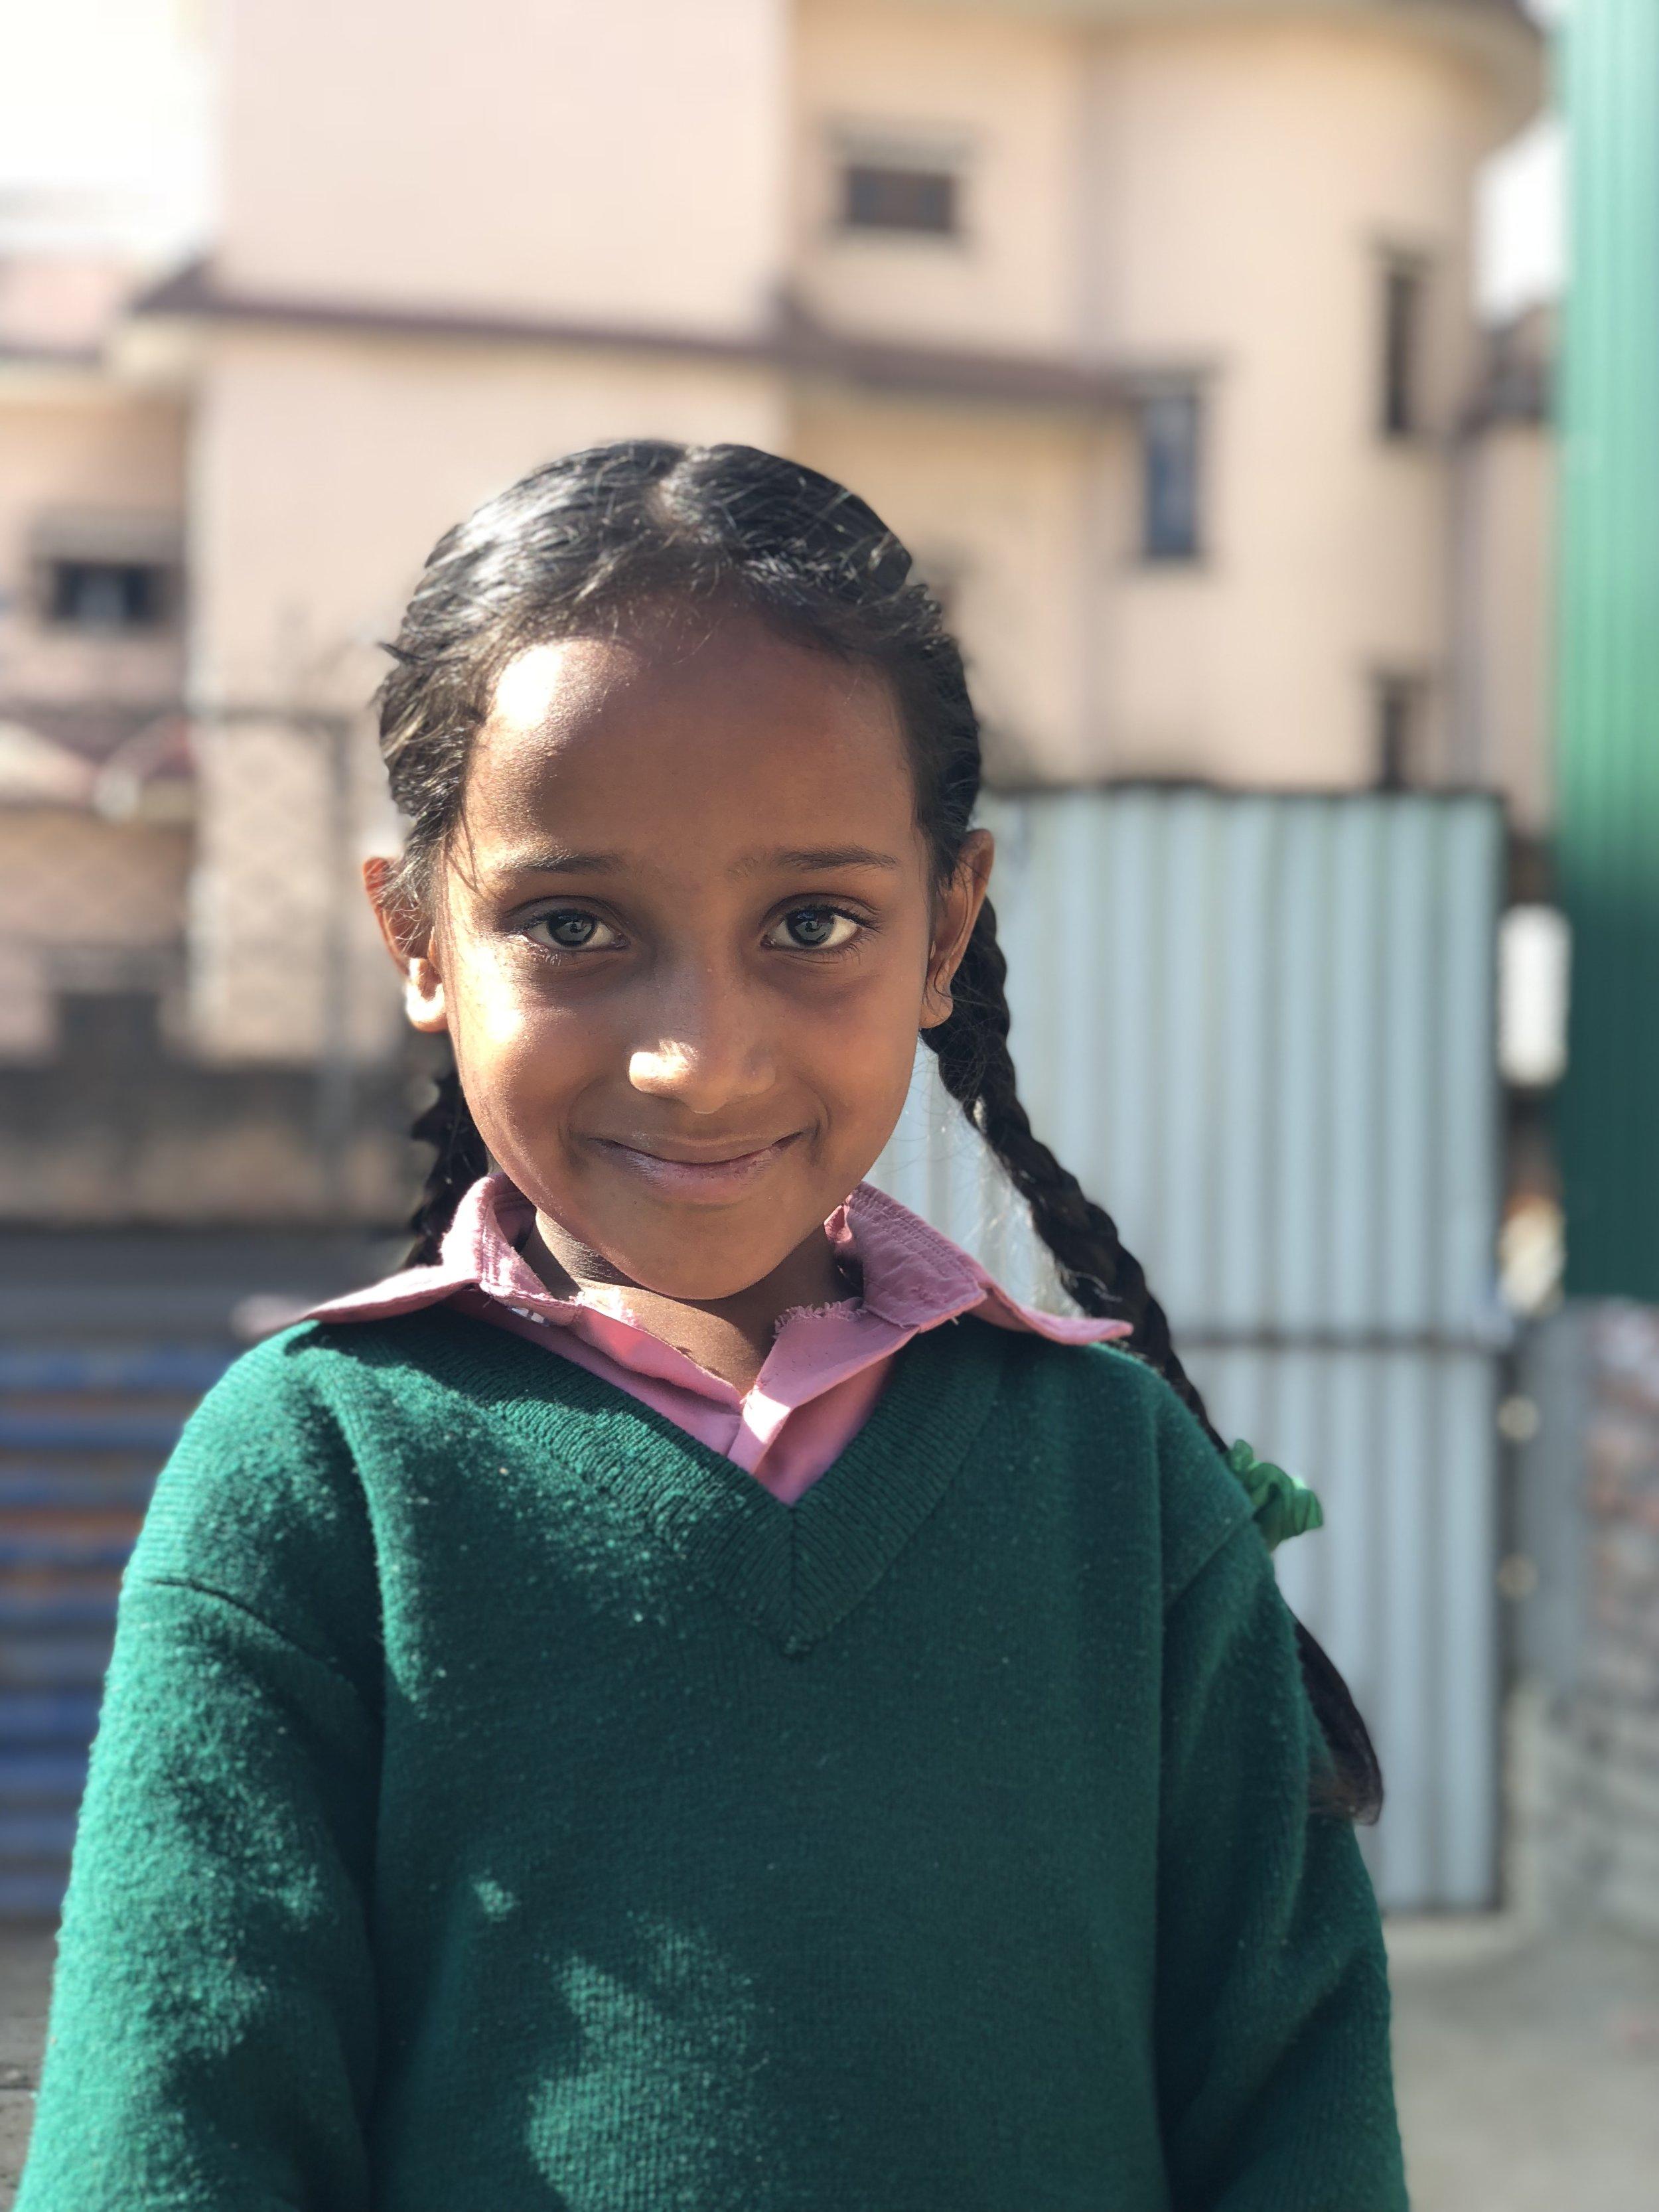 Kripa  Age 8  She wants to become a doctor